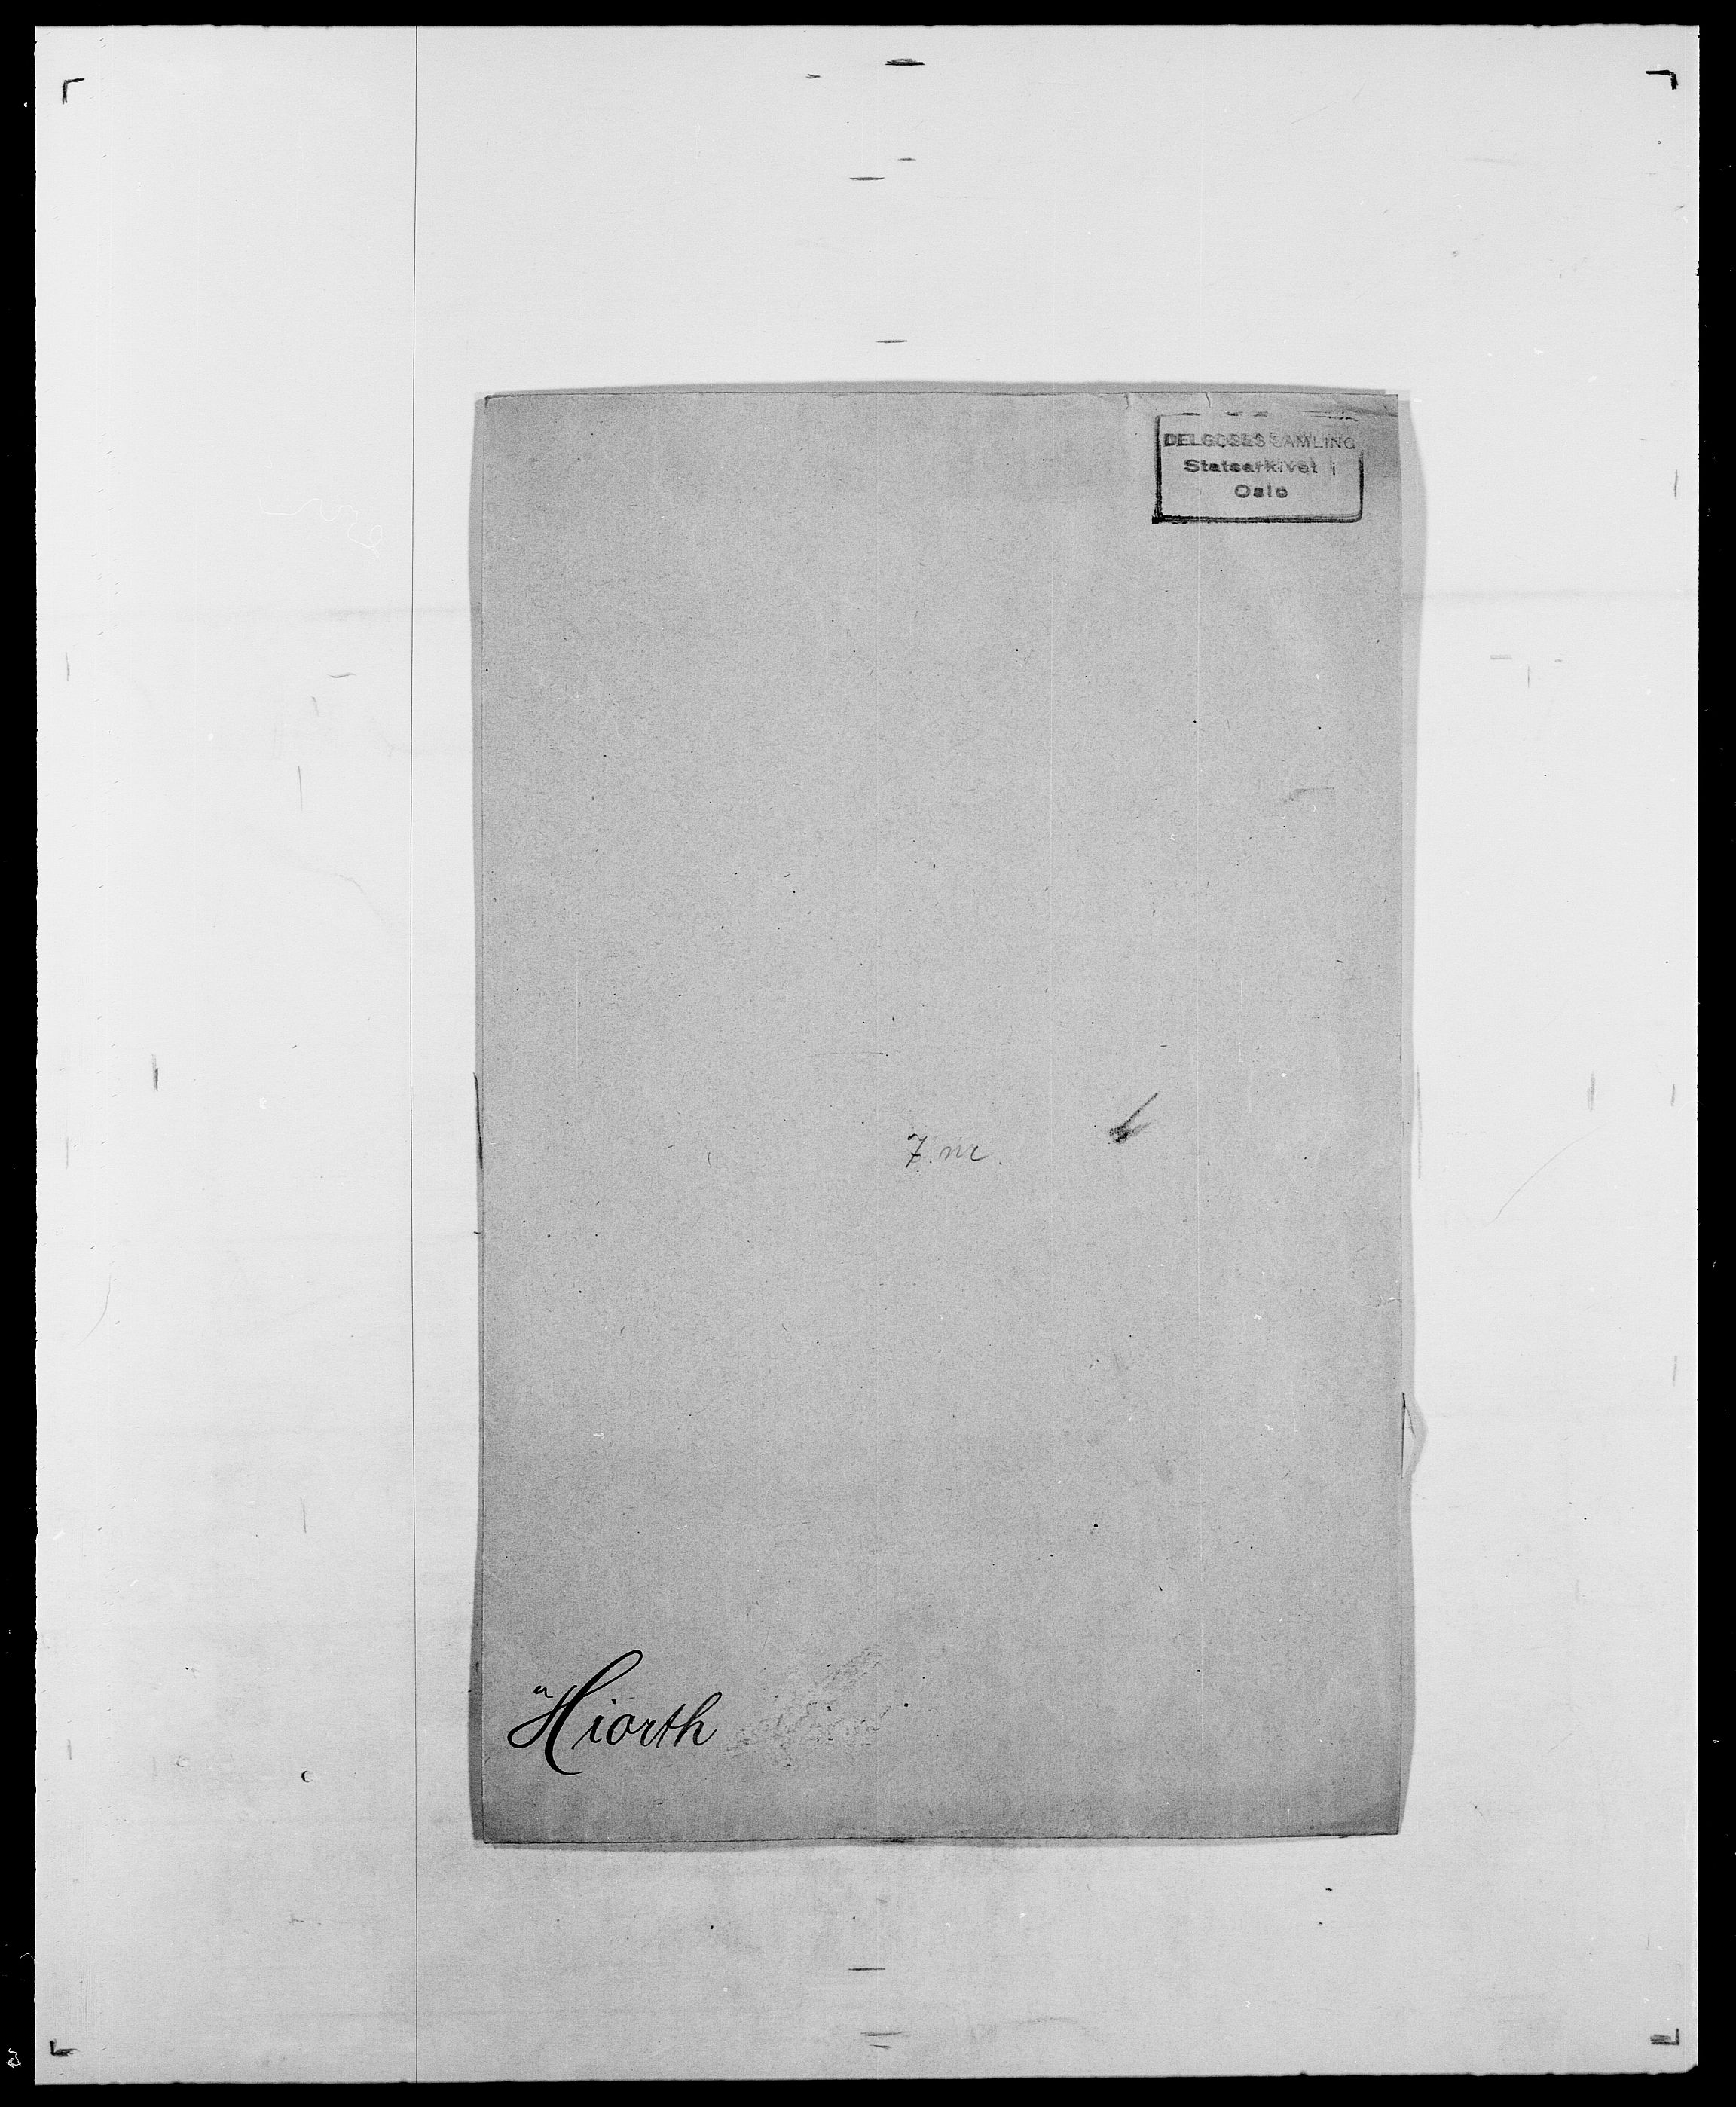 SAO, Delgobe, Charles Antoine - samling, D/Da/L0017: Helander - Hjørne, s. 500